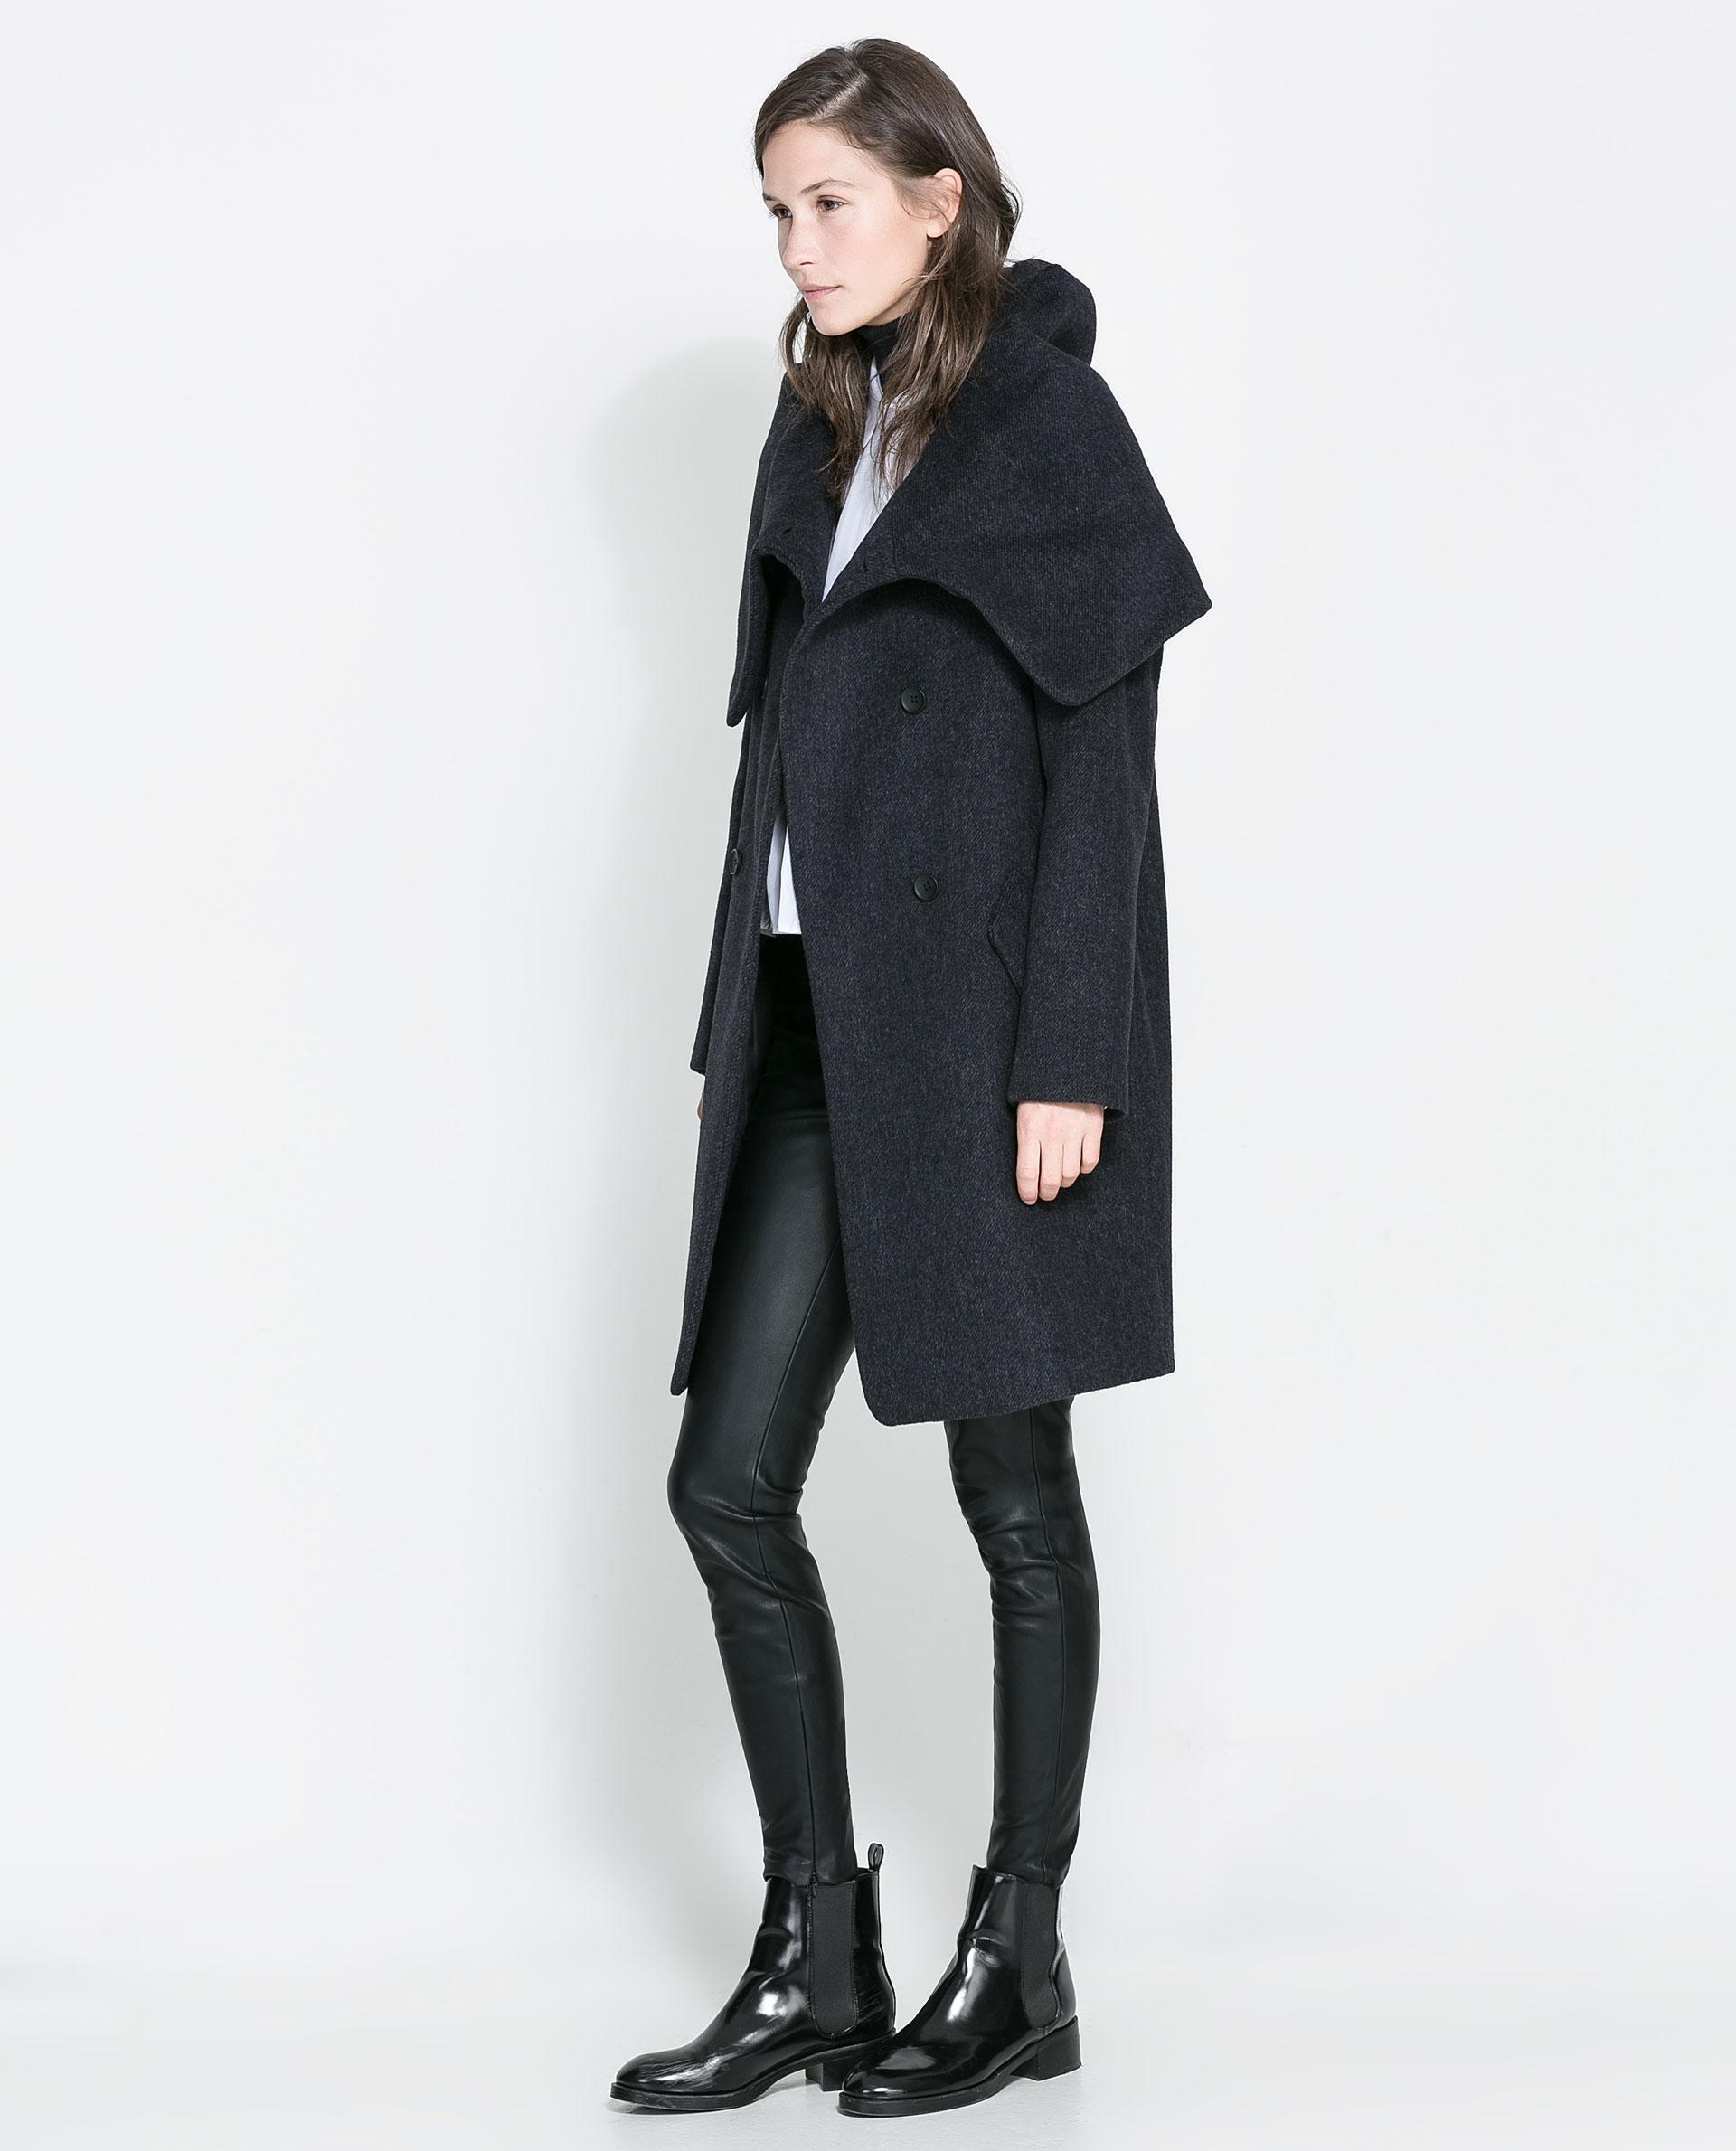 Zara Wollen Wraparound Coat in Gray | Lyst